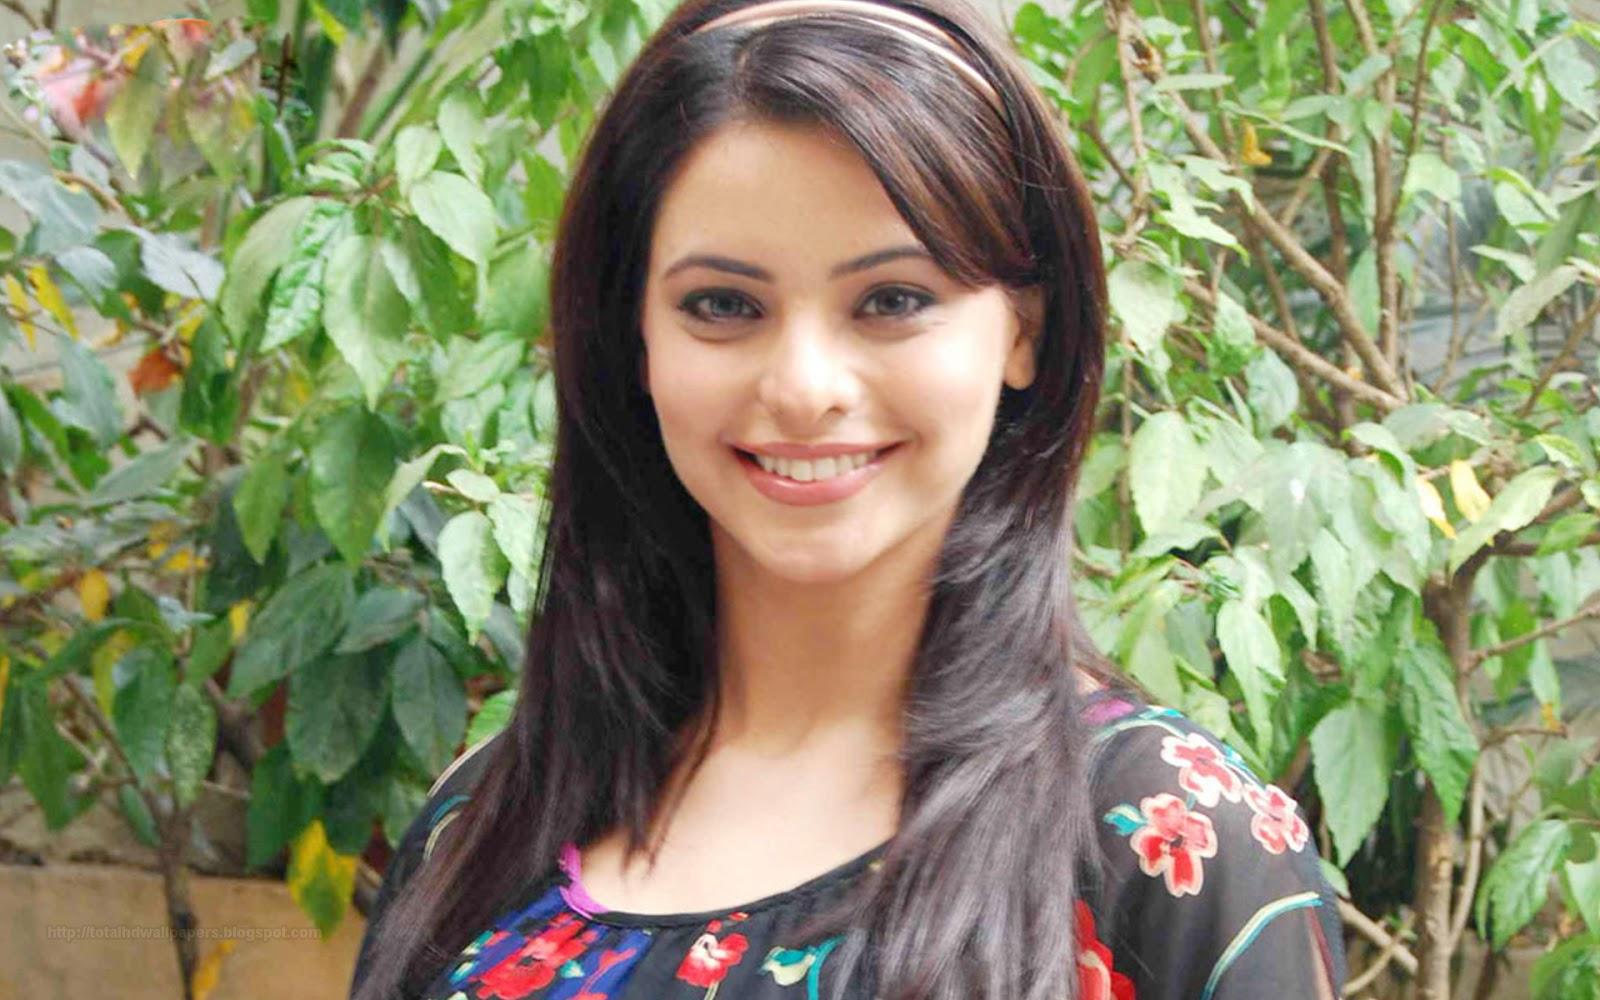 HD Wallpapers Bollywood Actress HD Wallpapers 1080p 1600x1000